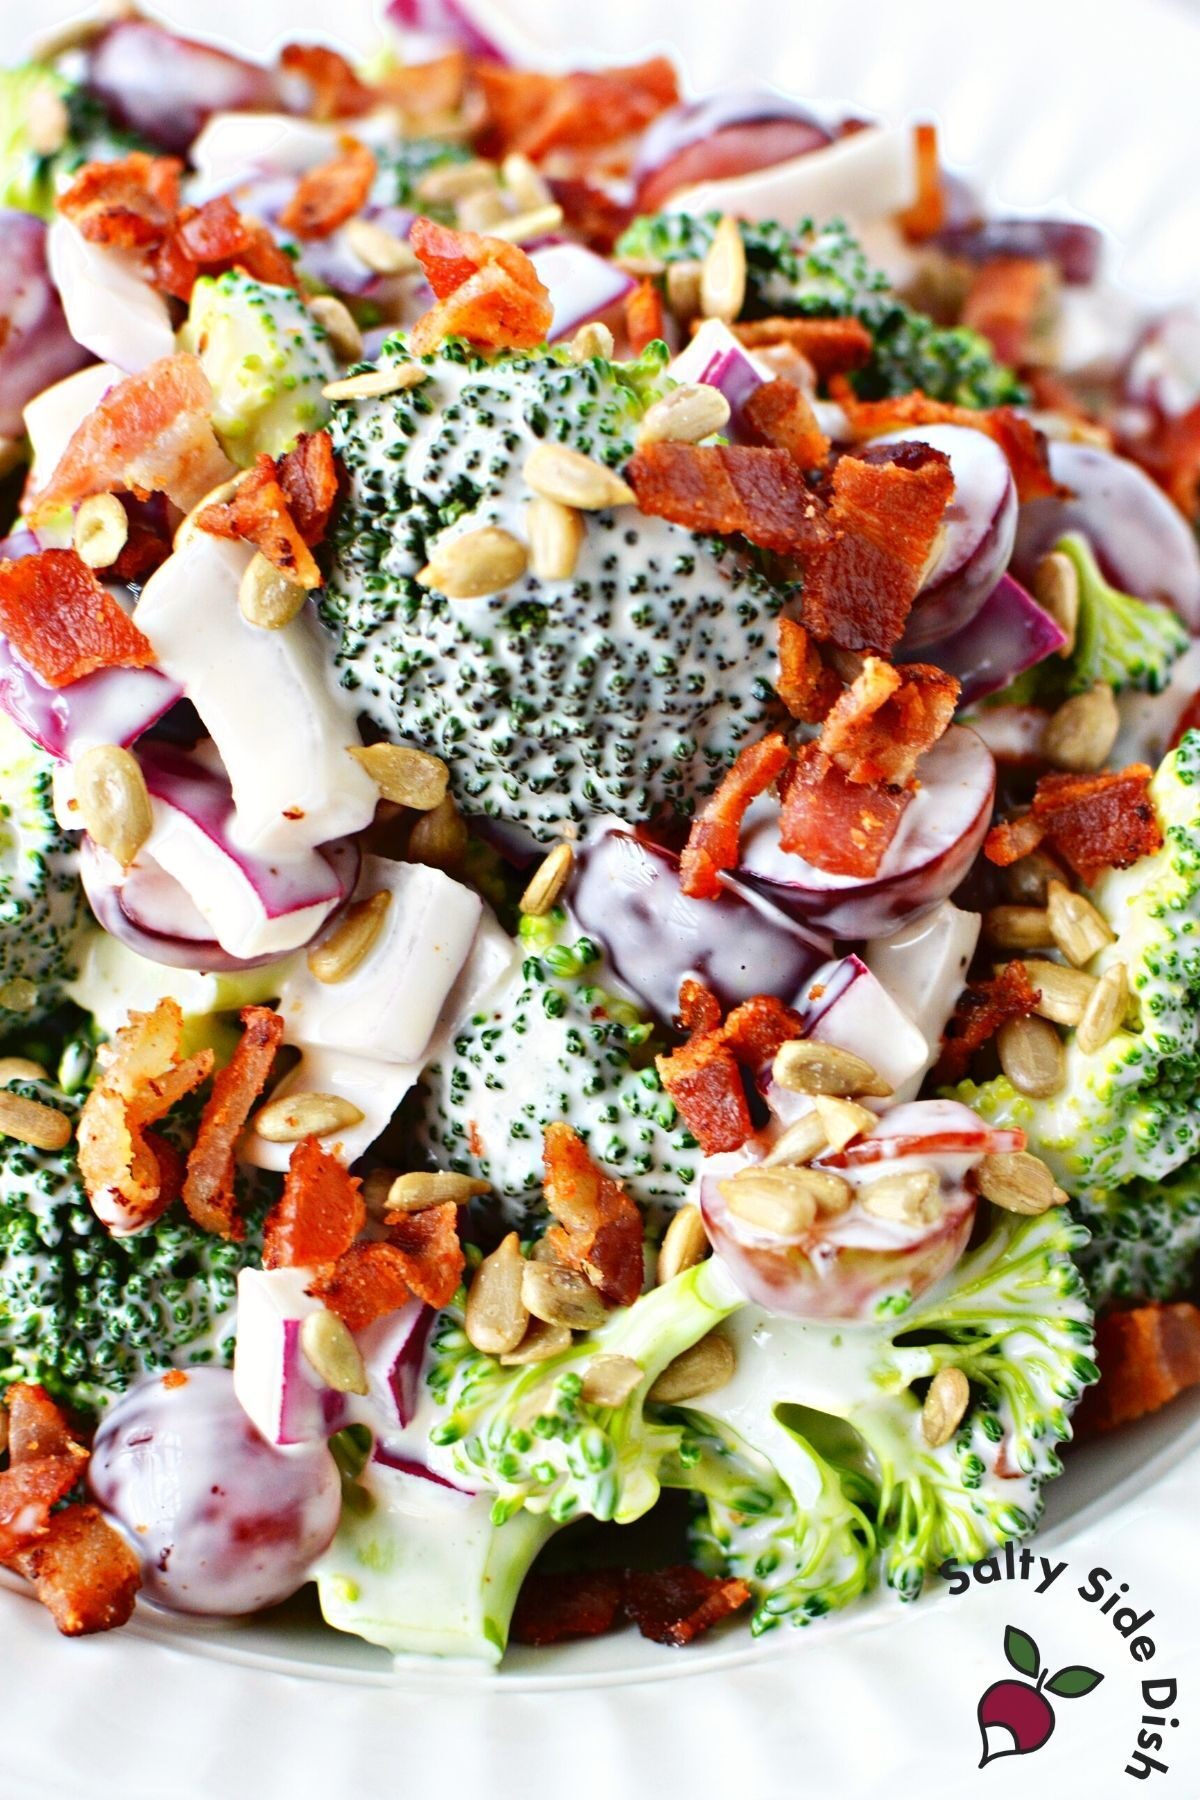 red grape broccoli salad made in advance.